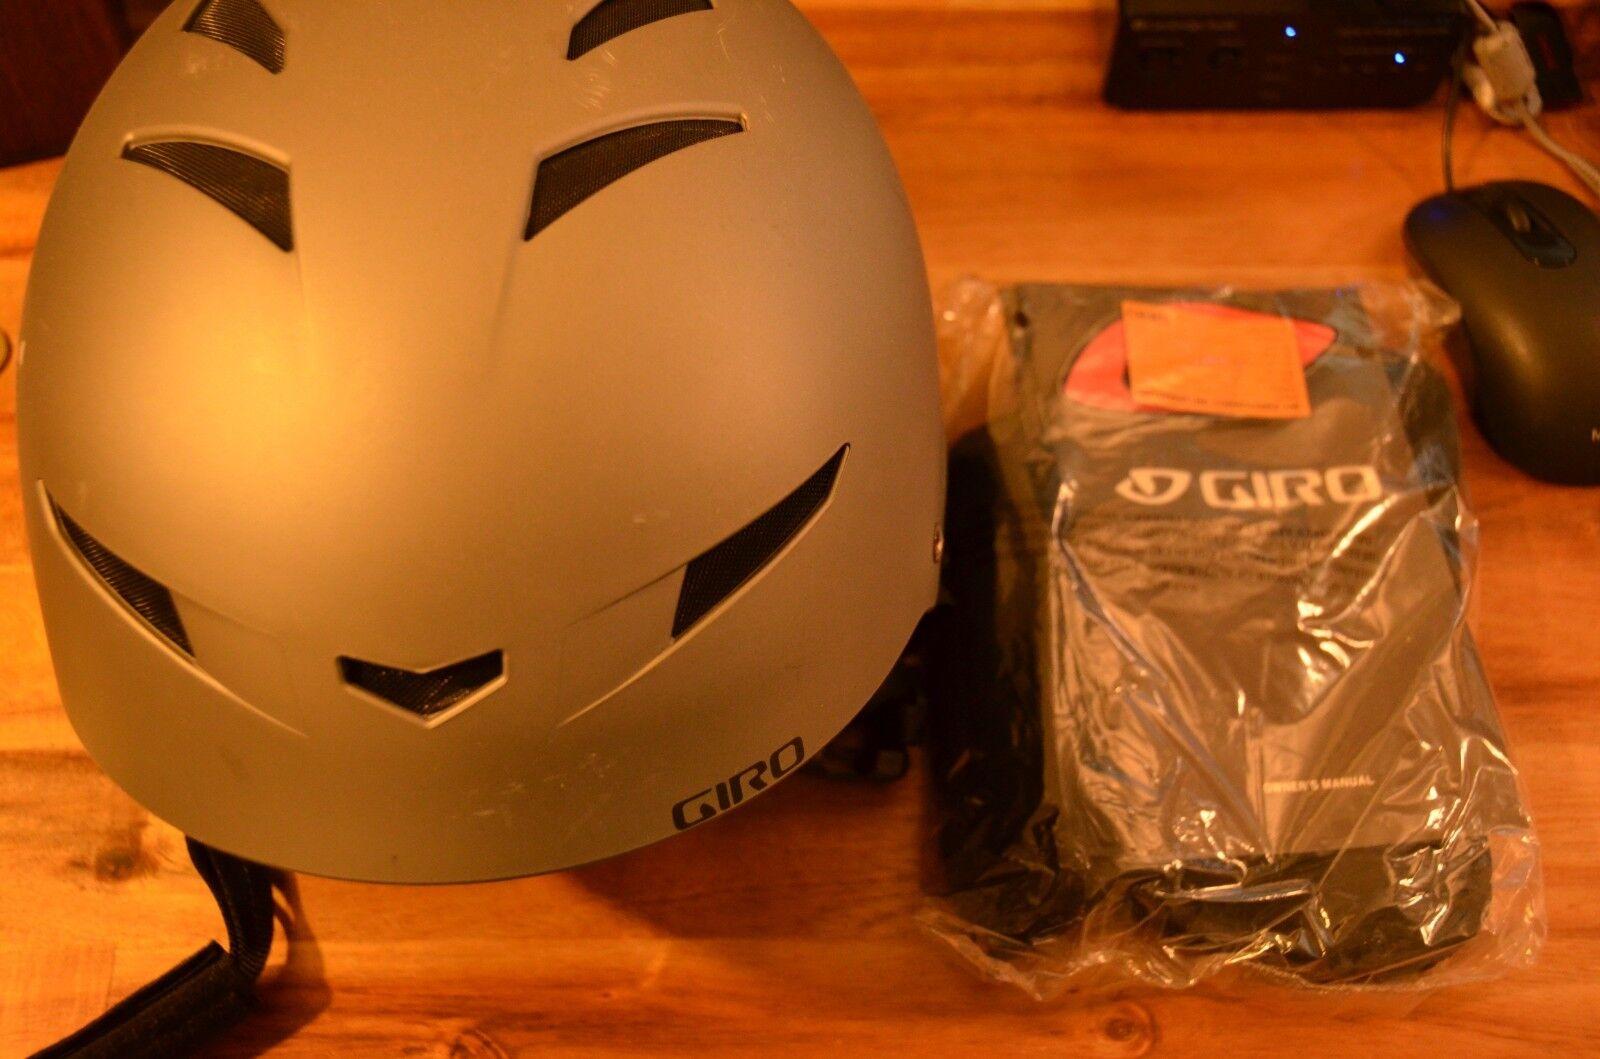 Boxed Giro Encore 2 Matt Titanium Ski Snowboard bike helmet  size M 55.5-59cm  incentive promotionals